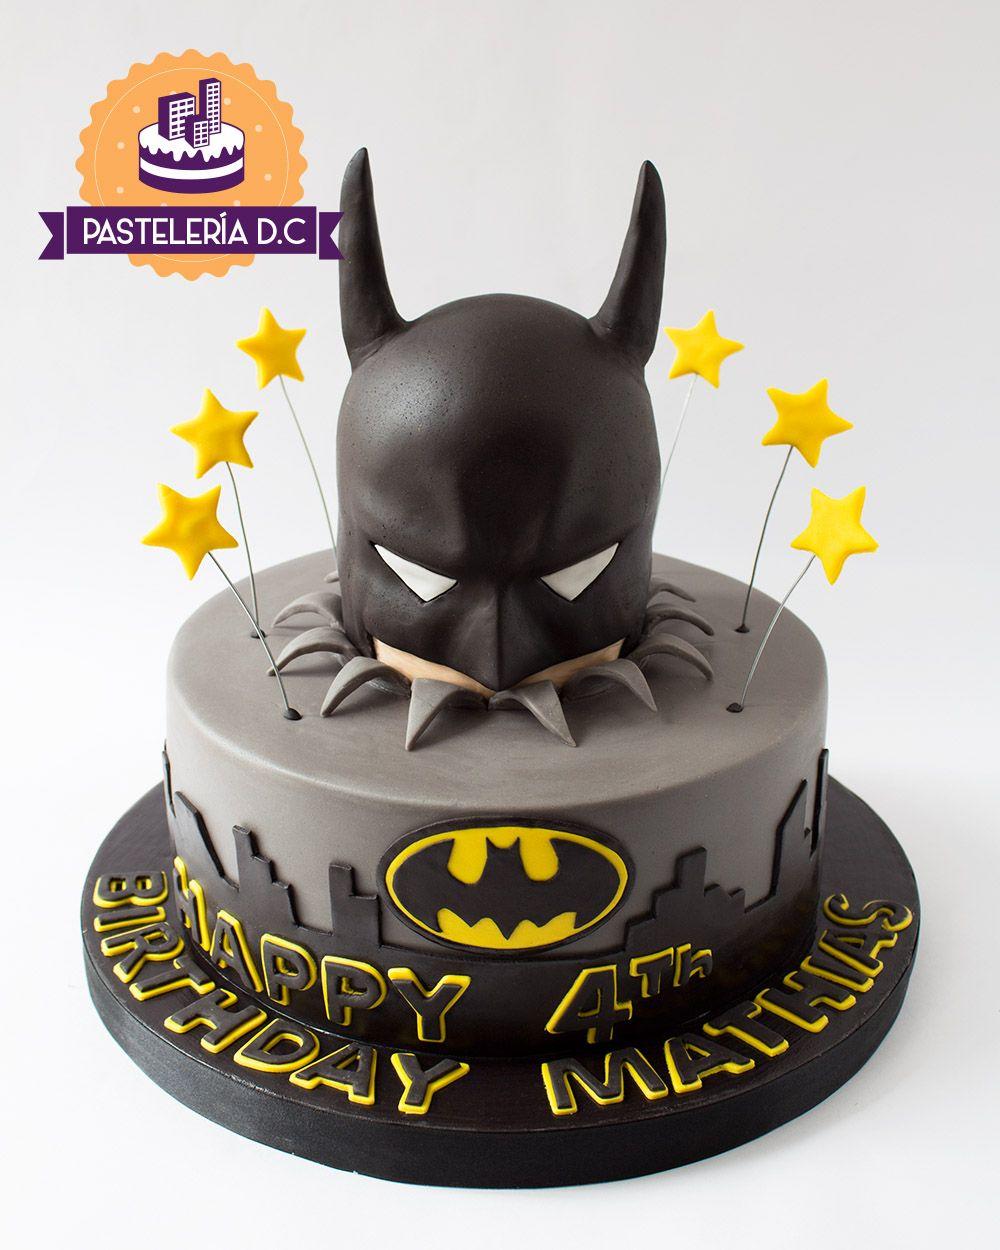 Torta Con Dise 241 O Personalizado De Batman Batman Cake